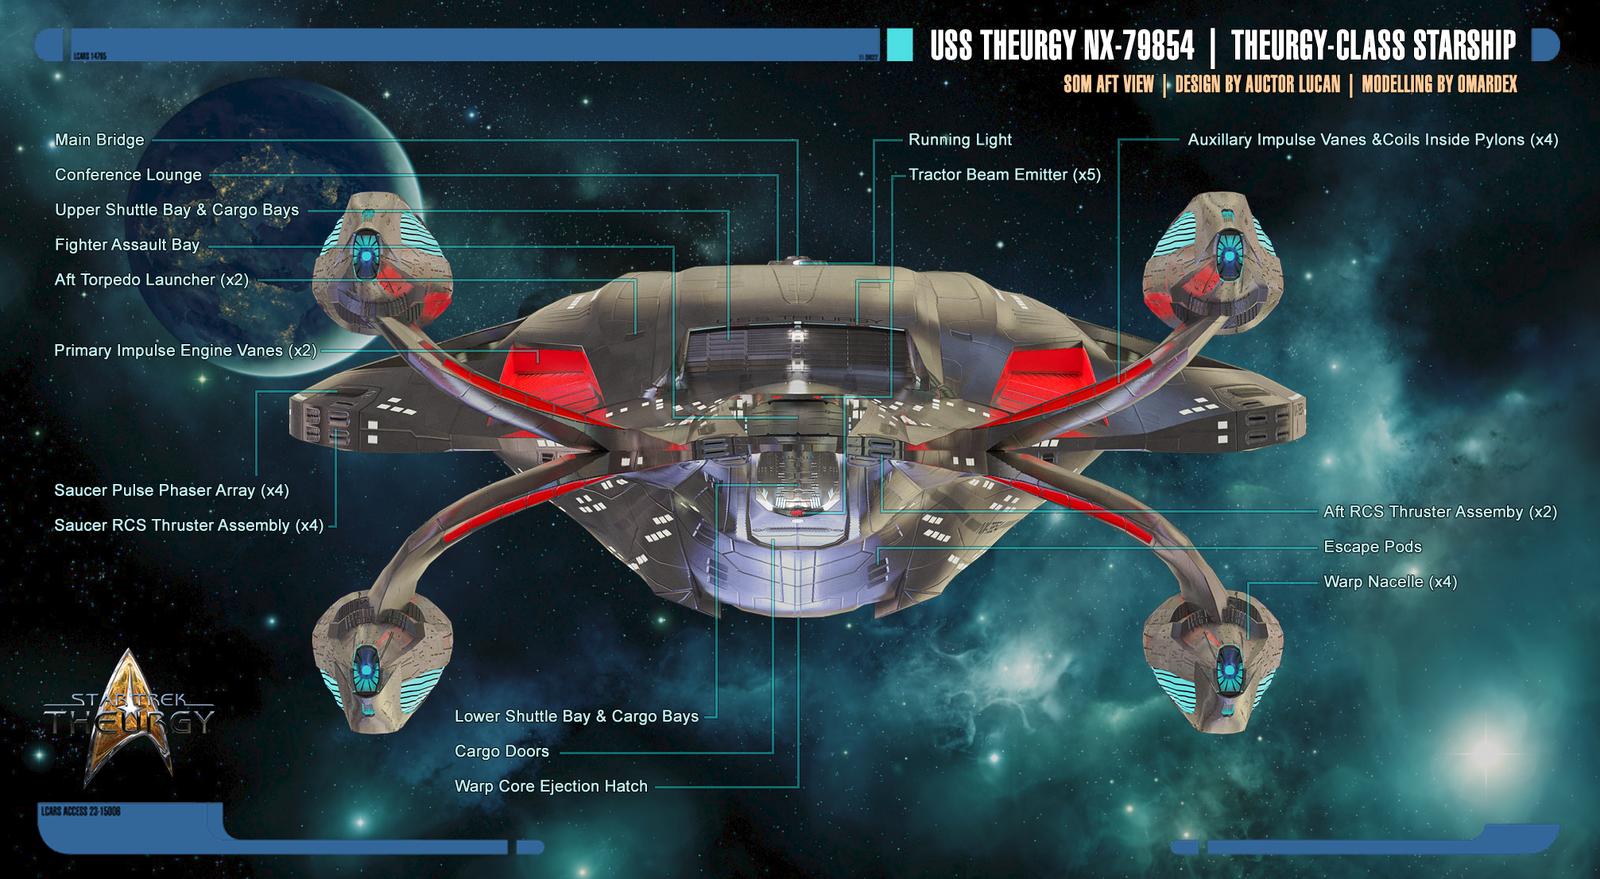 theurgy_class_starship_schematics___aft_